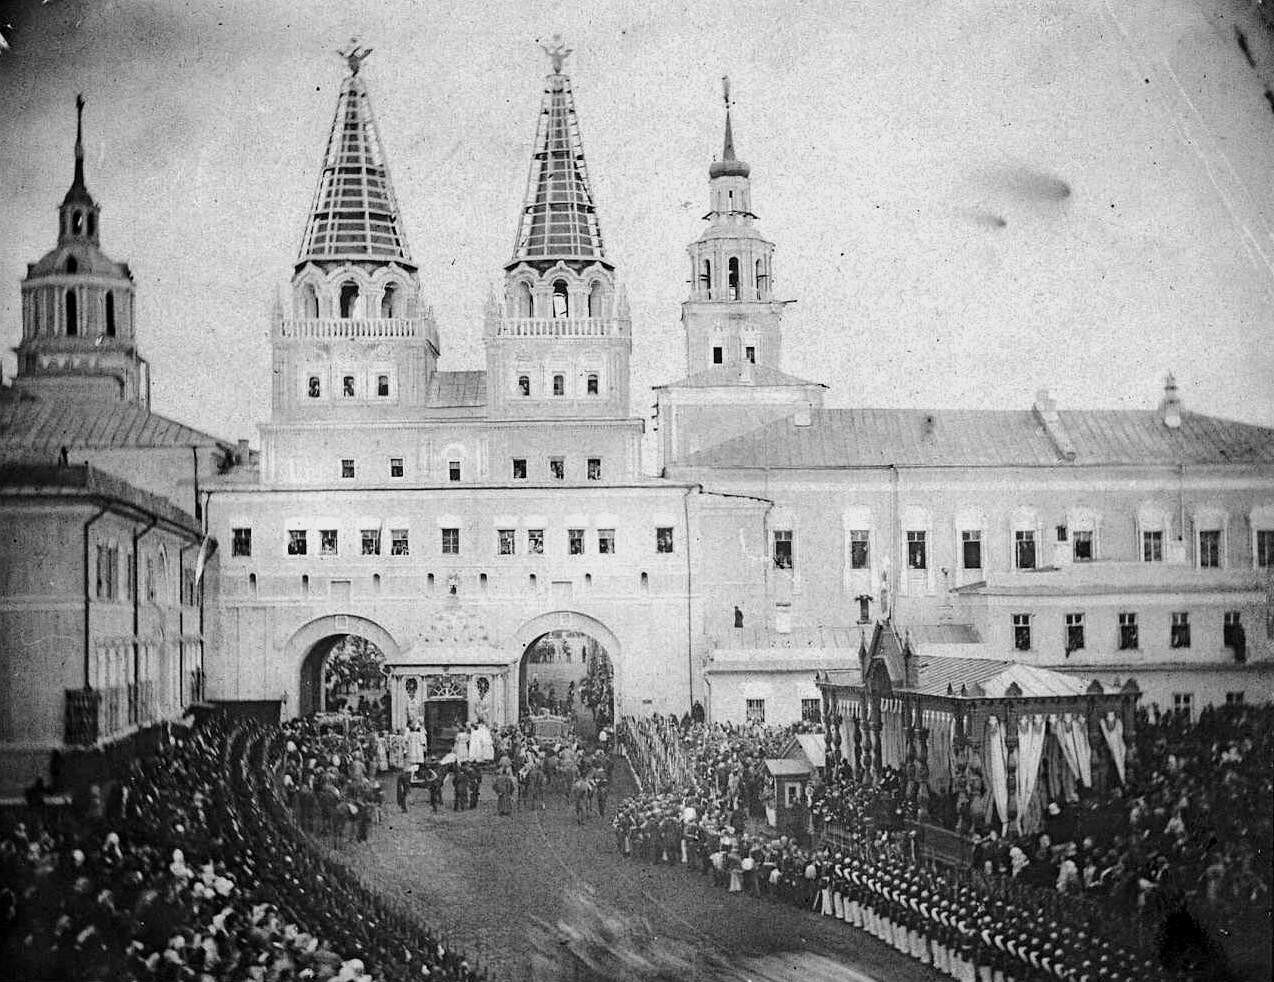 763614 Александр II. Фотографии с коронационных торжеств.jpg